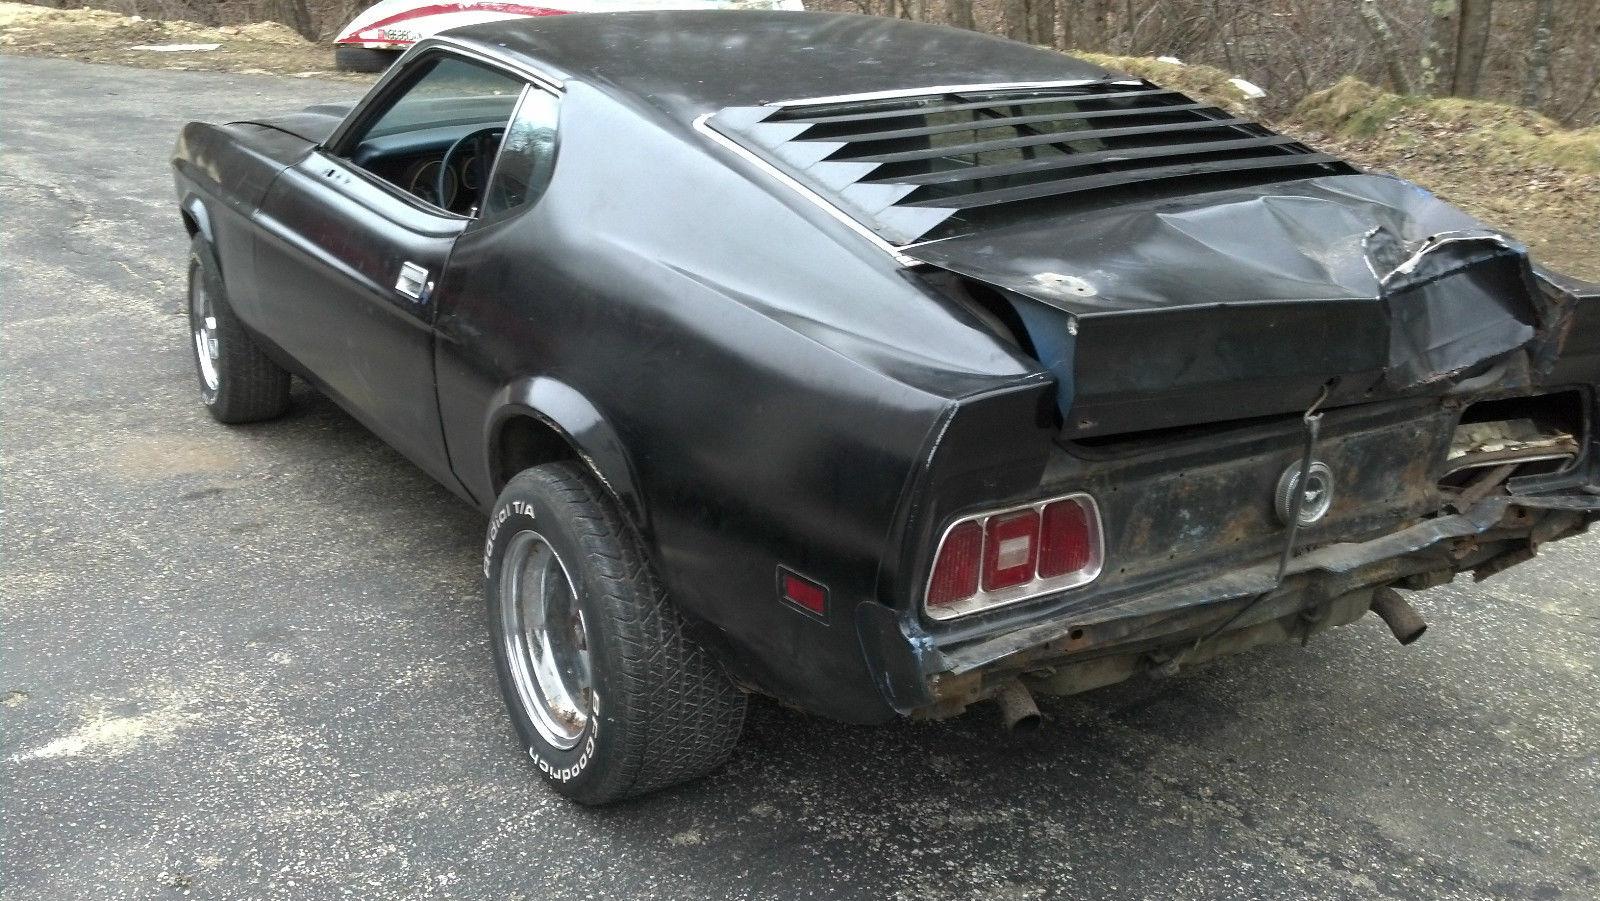 1973 Ford Mustang MACh 1 351 Cobra Jet 4 speed needs work